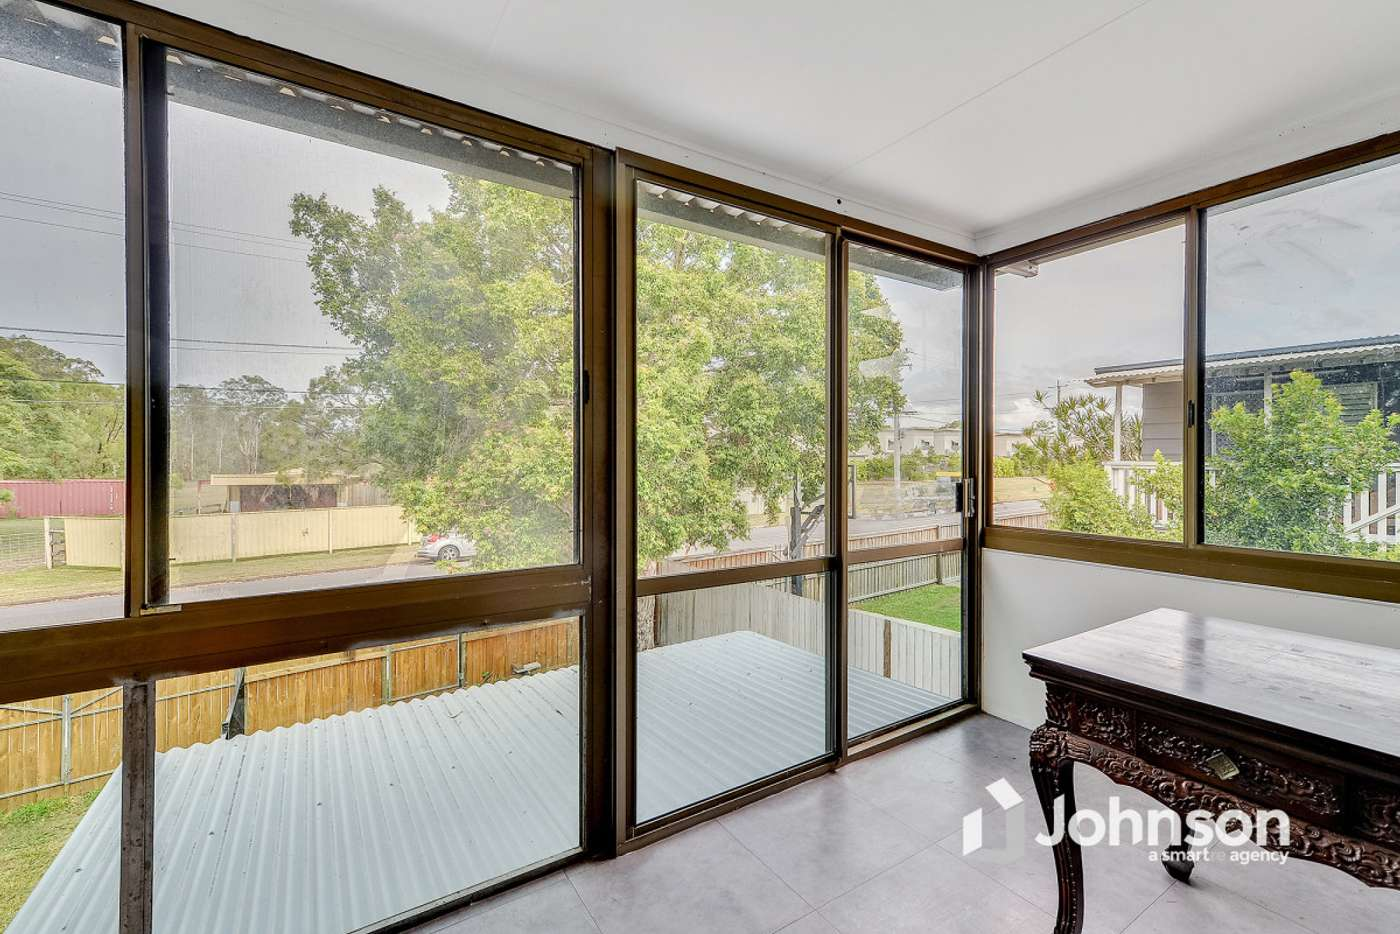 Sixth view of Homely house listing, 223 Kianawah Road, Wynnum West QLD 4178